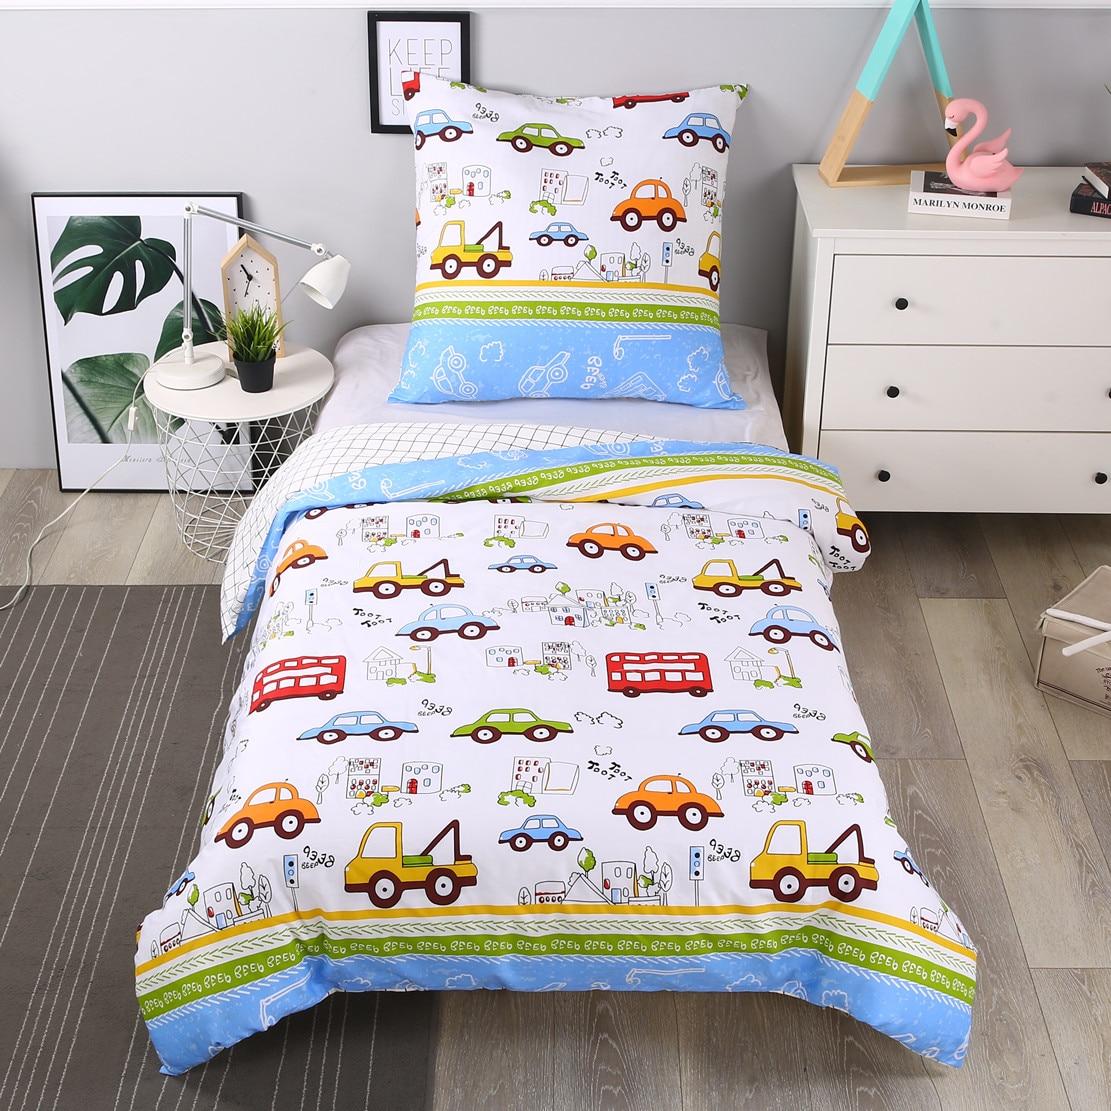 Kids Boys Bedding Set Cars Vehicles Duvet Cover Soft Kids Duvet Cover Set Quilt Cover 100% Cotton Bed Set 2pcs Set